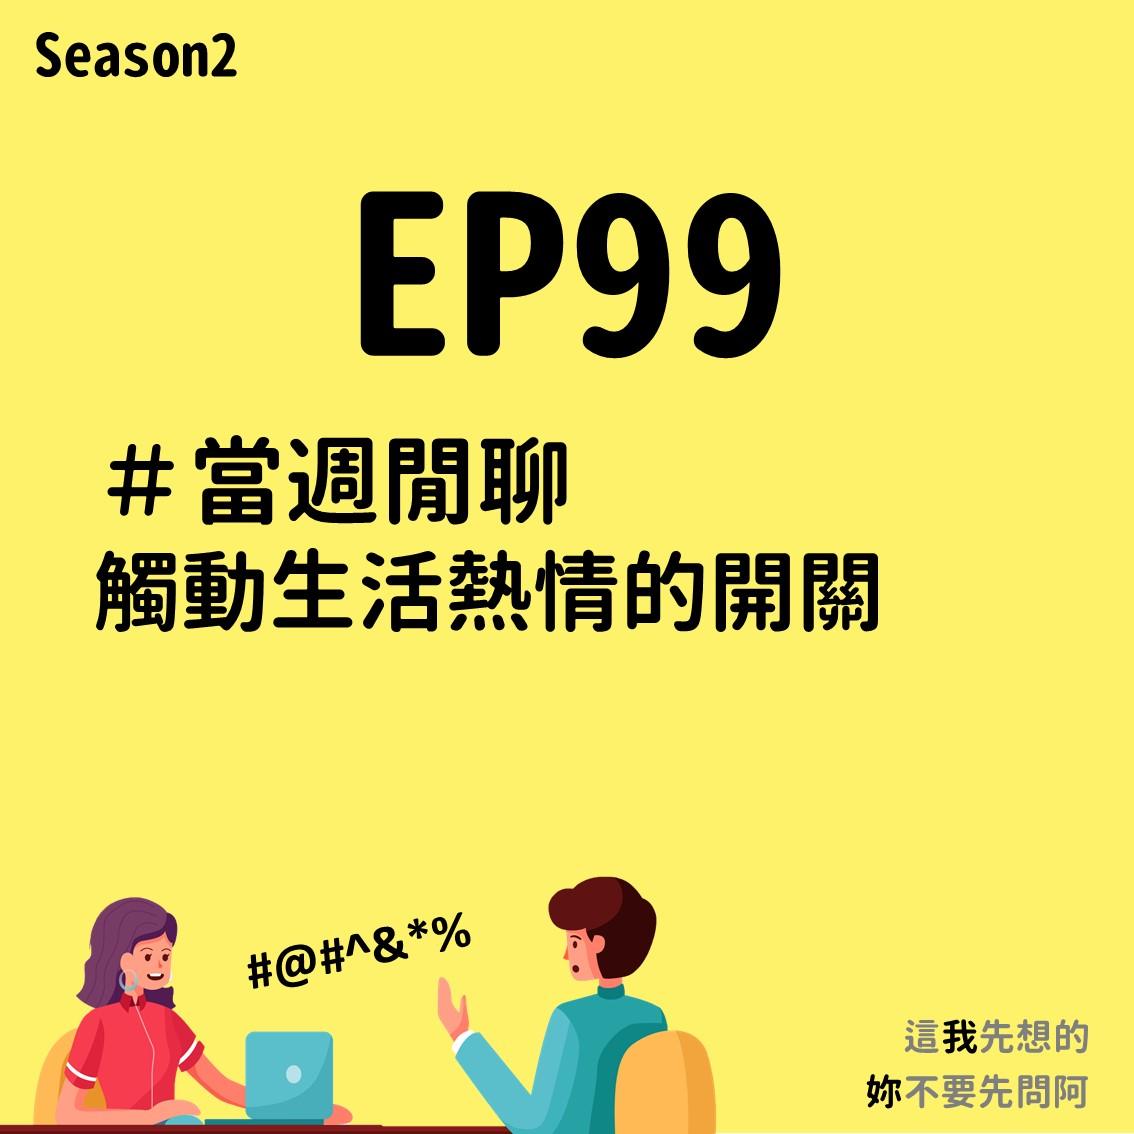 EP99 當週閒聊|觸動生活熱情的開關